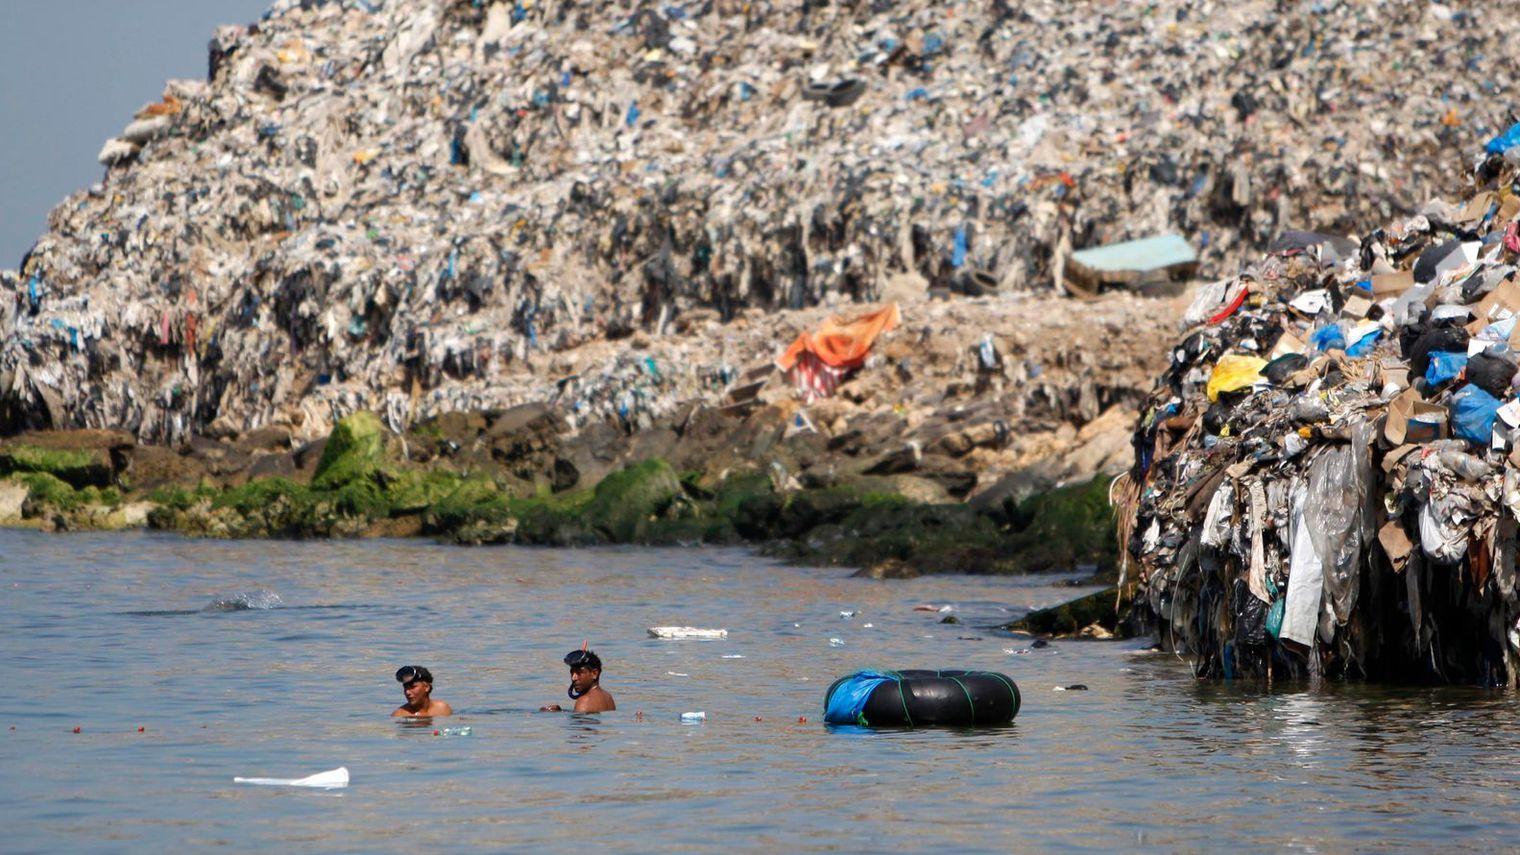 pollution en 2050 les oc an seront remplis de plastiques que de poissons diaf tv. Black Bedroom Furniture Sets. Home Design Ideas